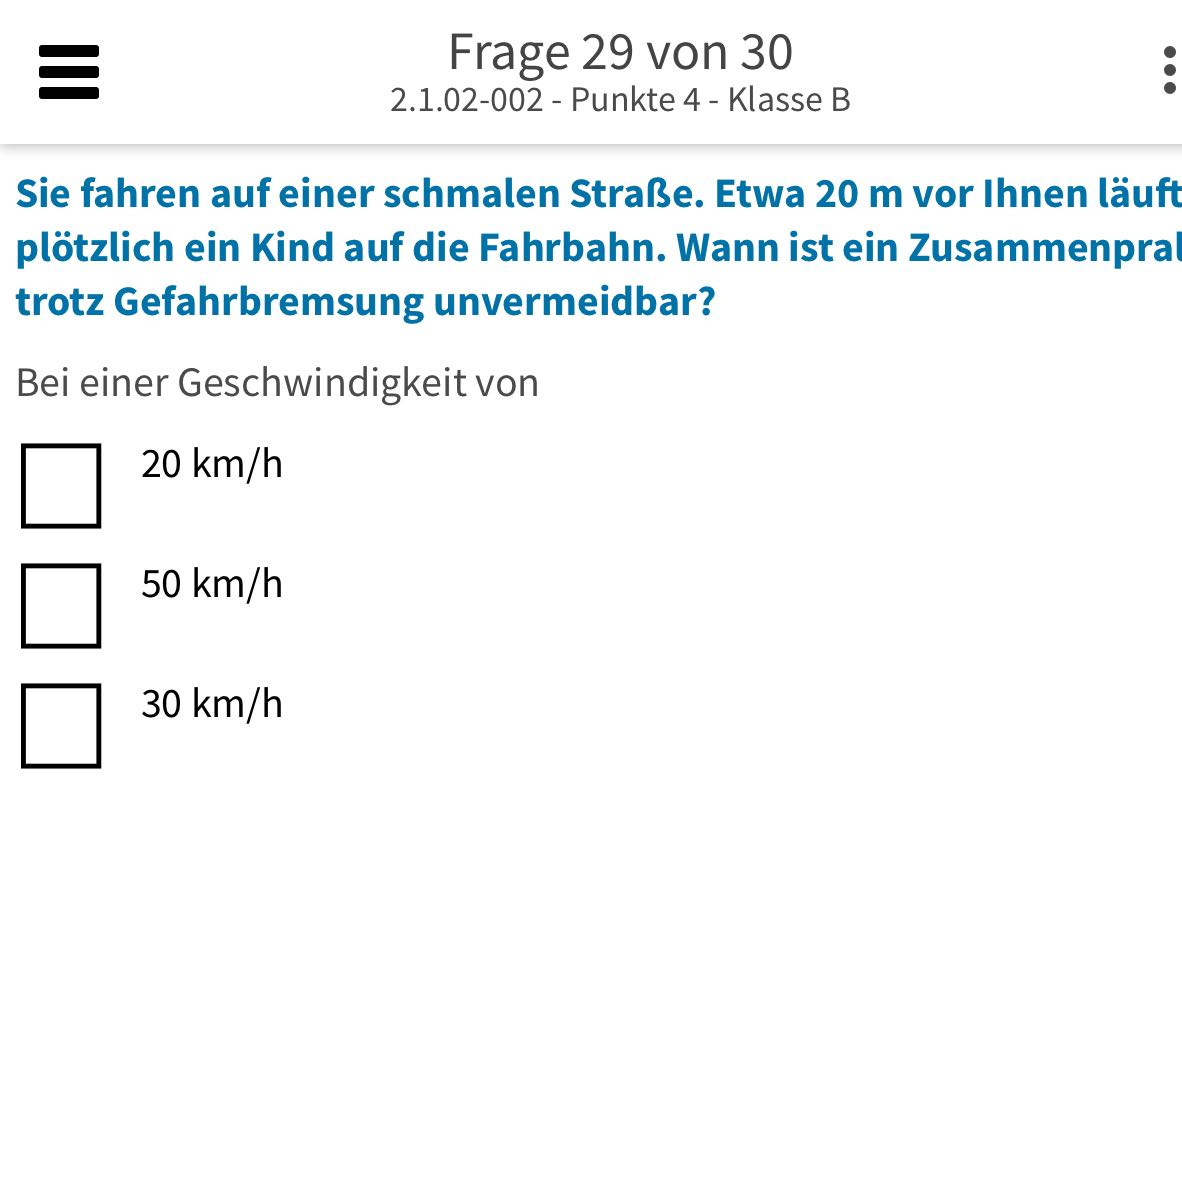 Erfreut Harcourt Sozialkunde Grad 2 Arbeitsblatt Bilder - Mathe ...